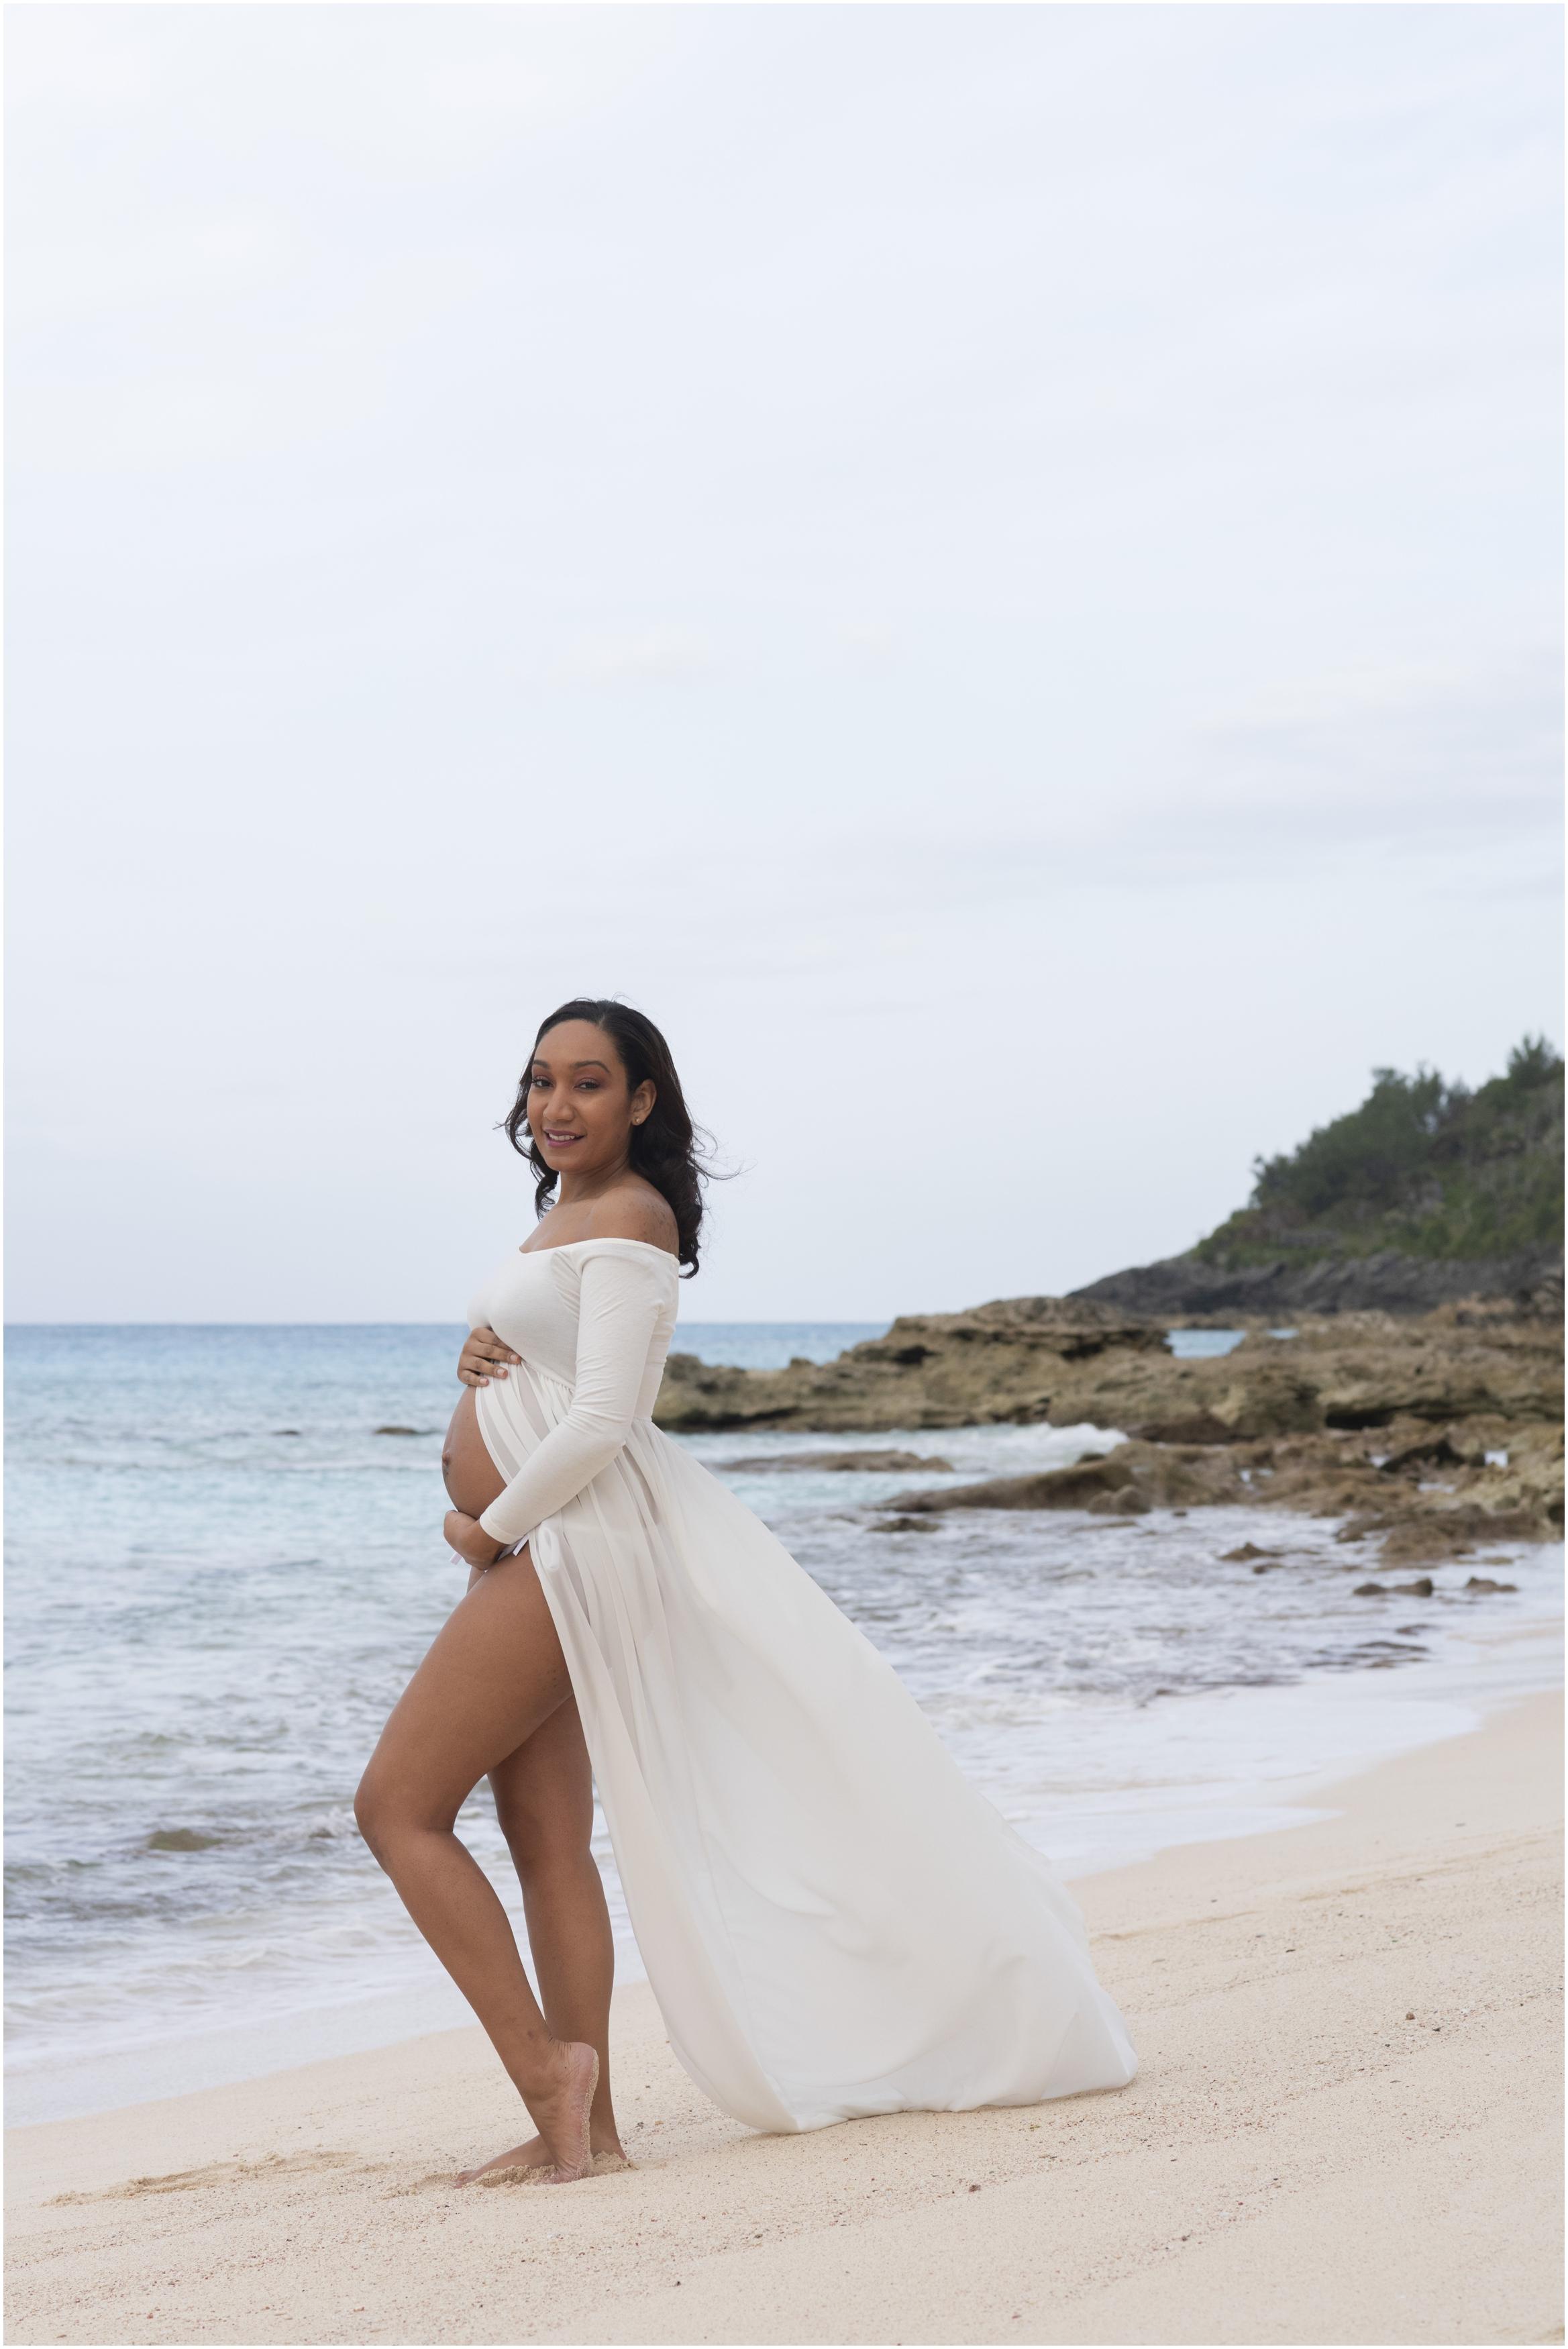 ©FianderFoto_Bermuda Maternity Photographer_Church Bay Beach_Tiffany_012.jpg